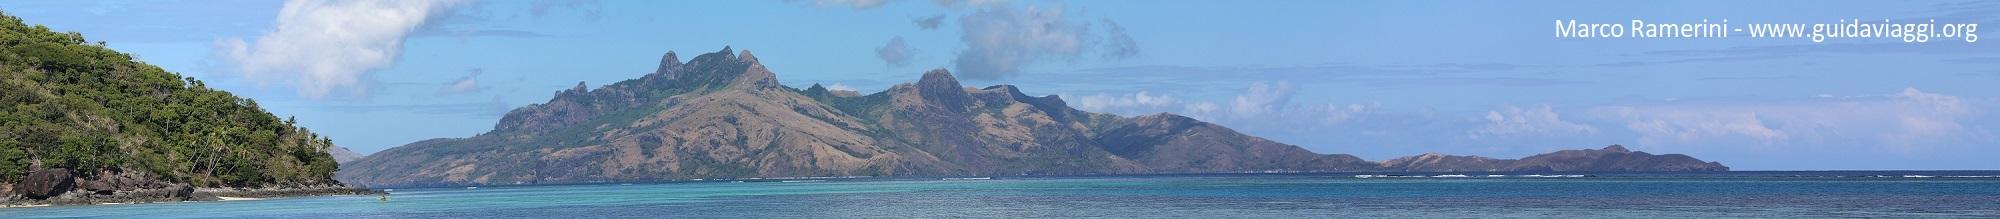 As montanhas da Ilha Waya, Ilhas Yasawa, Fiji. Autor e Copyright Marco Ramerini